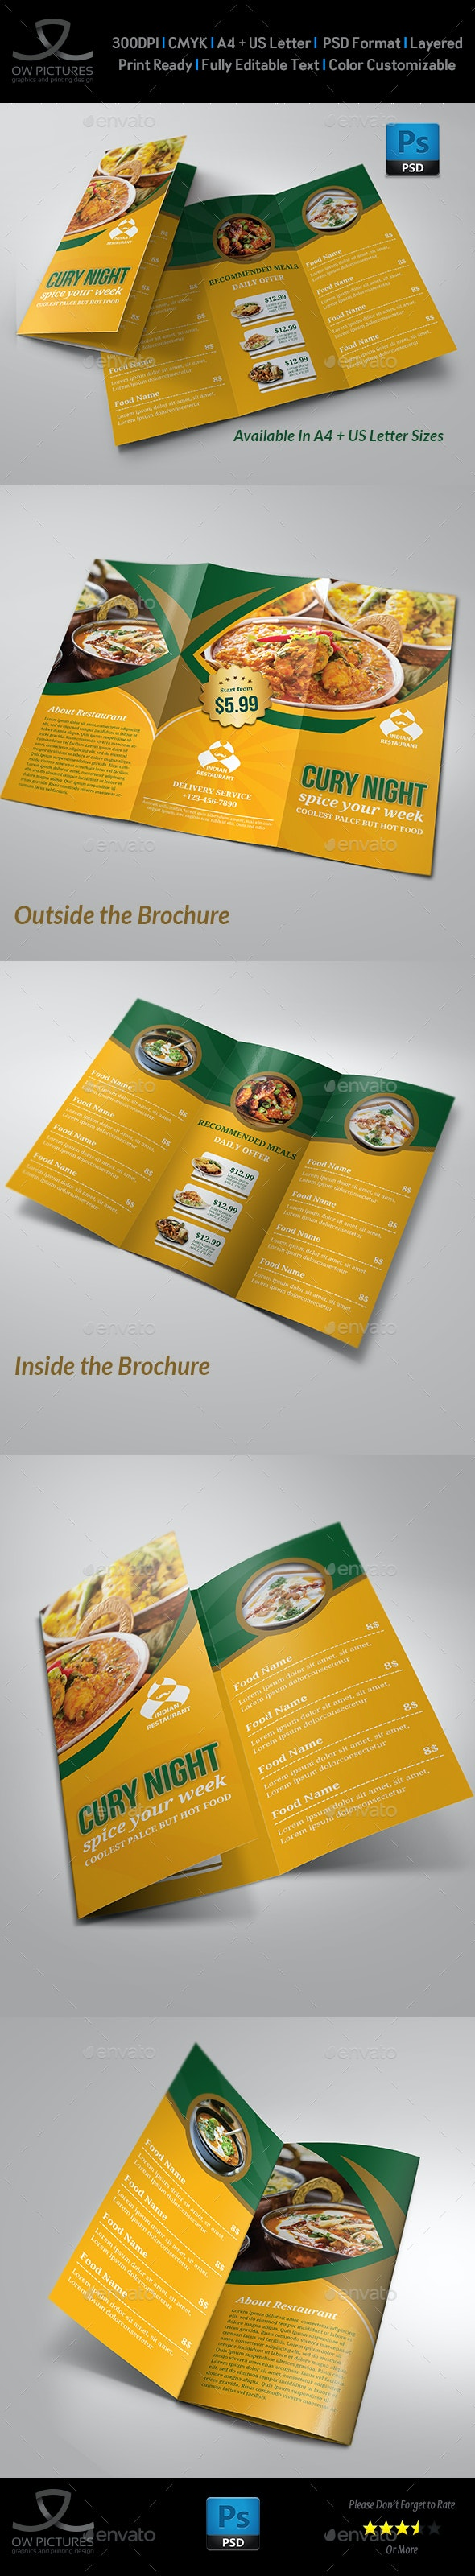 Indian Restaurant Food Menu Tri-Fold Brochure Template - Food Menus Print Templates